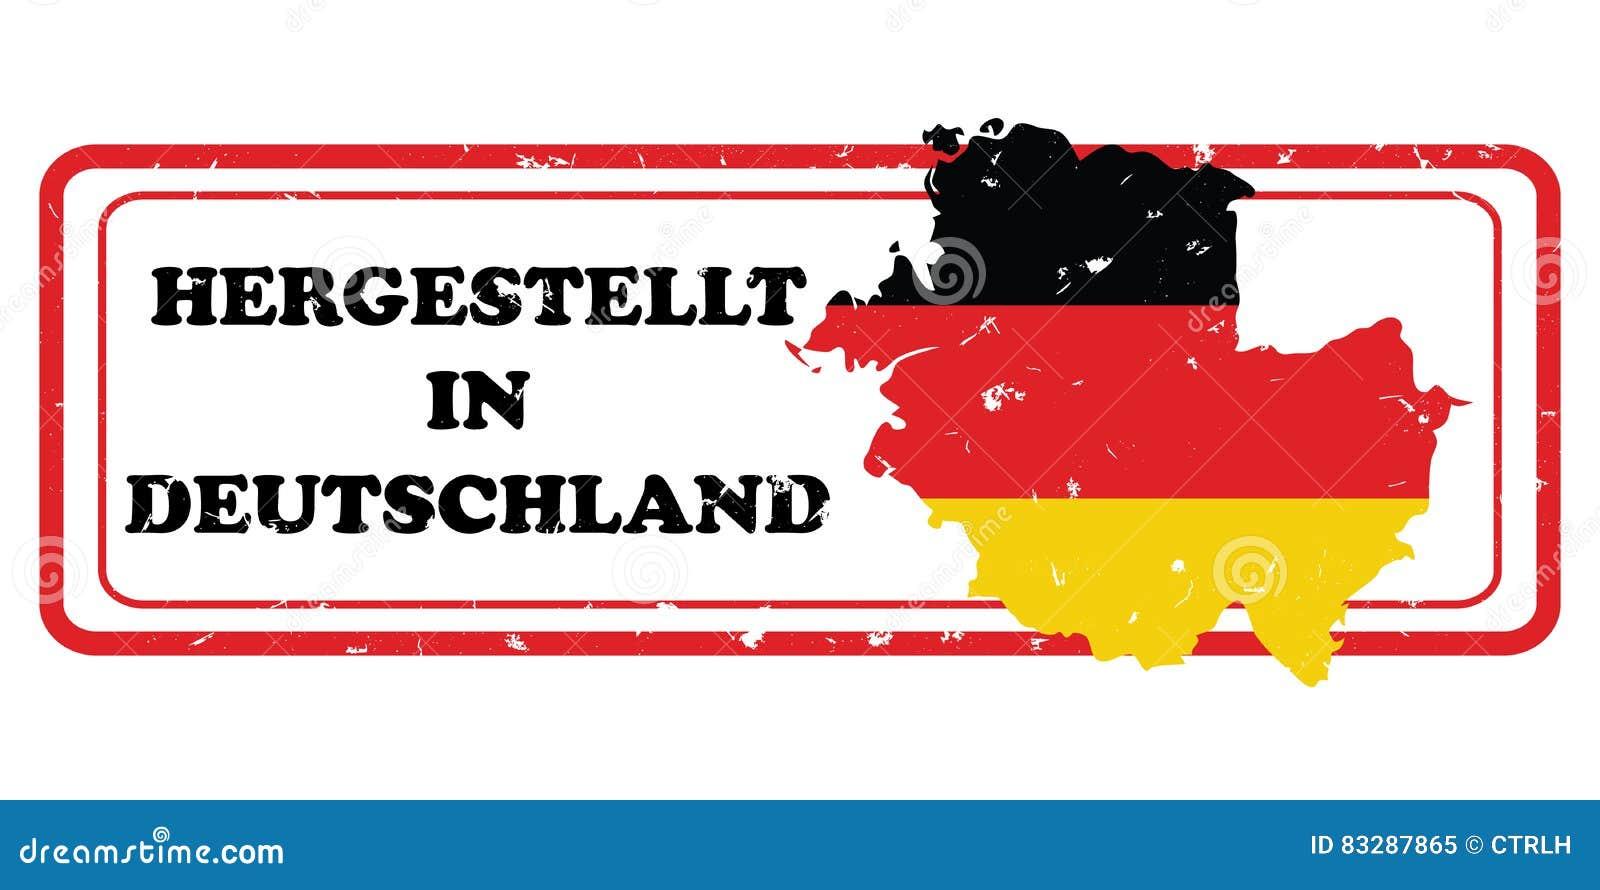 image regarding Printable German Flag called Developed In just Germany Printable Sticker Inside German Language Inventory